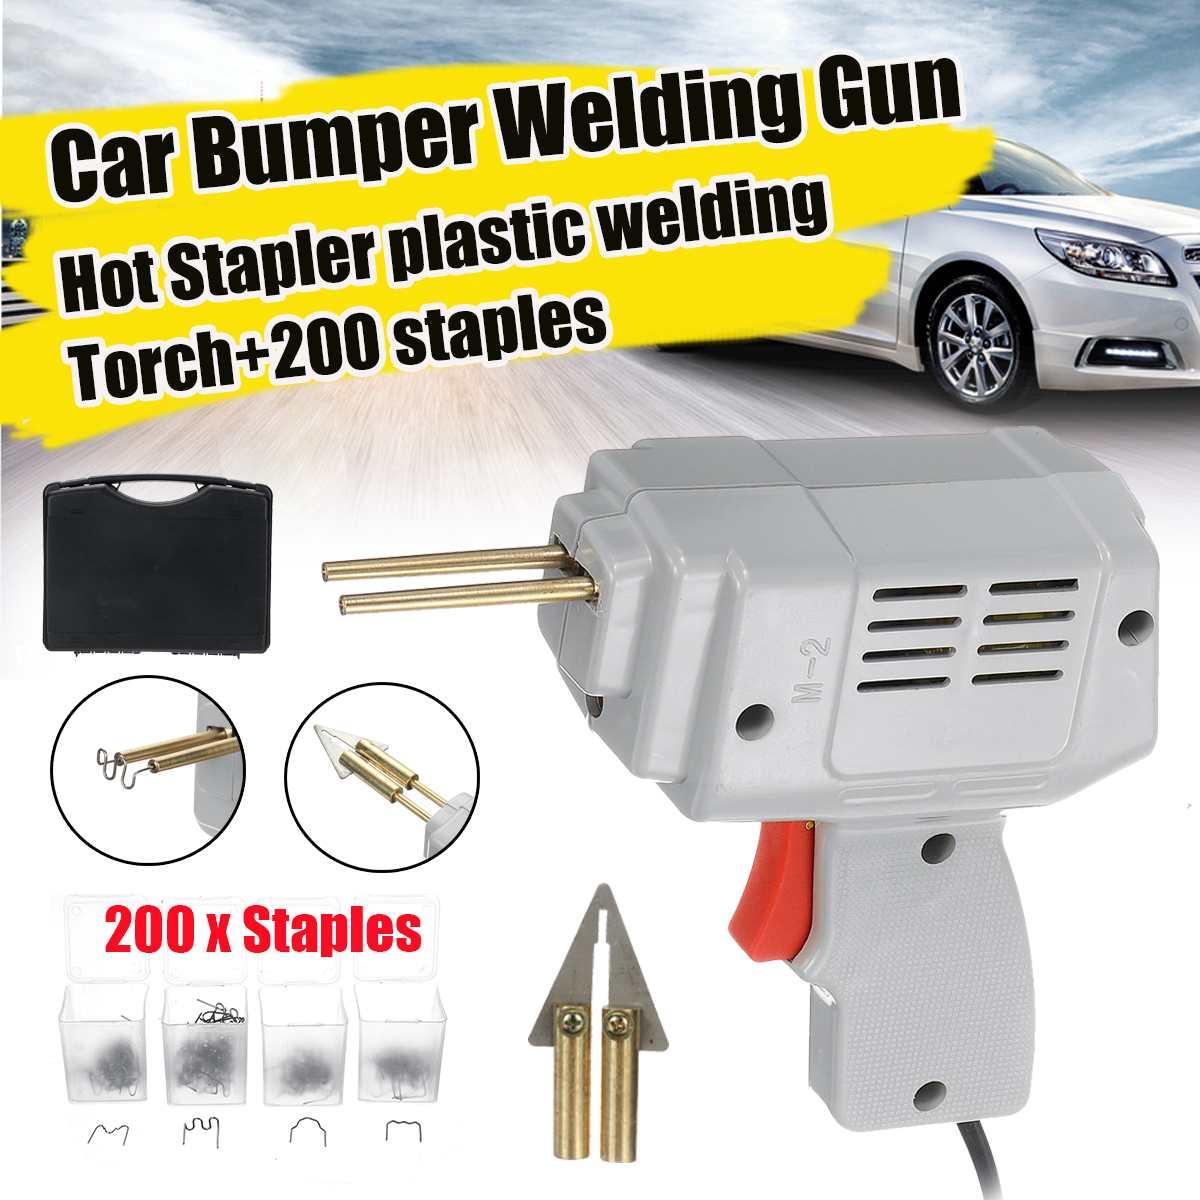 220v Handy Plastic Welder Garage Tools Hot Stapler Car Bumpe Plastic Welding Torch Repairing Machine Car Bumper Repair